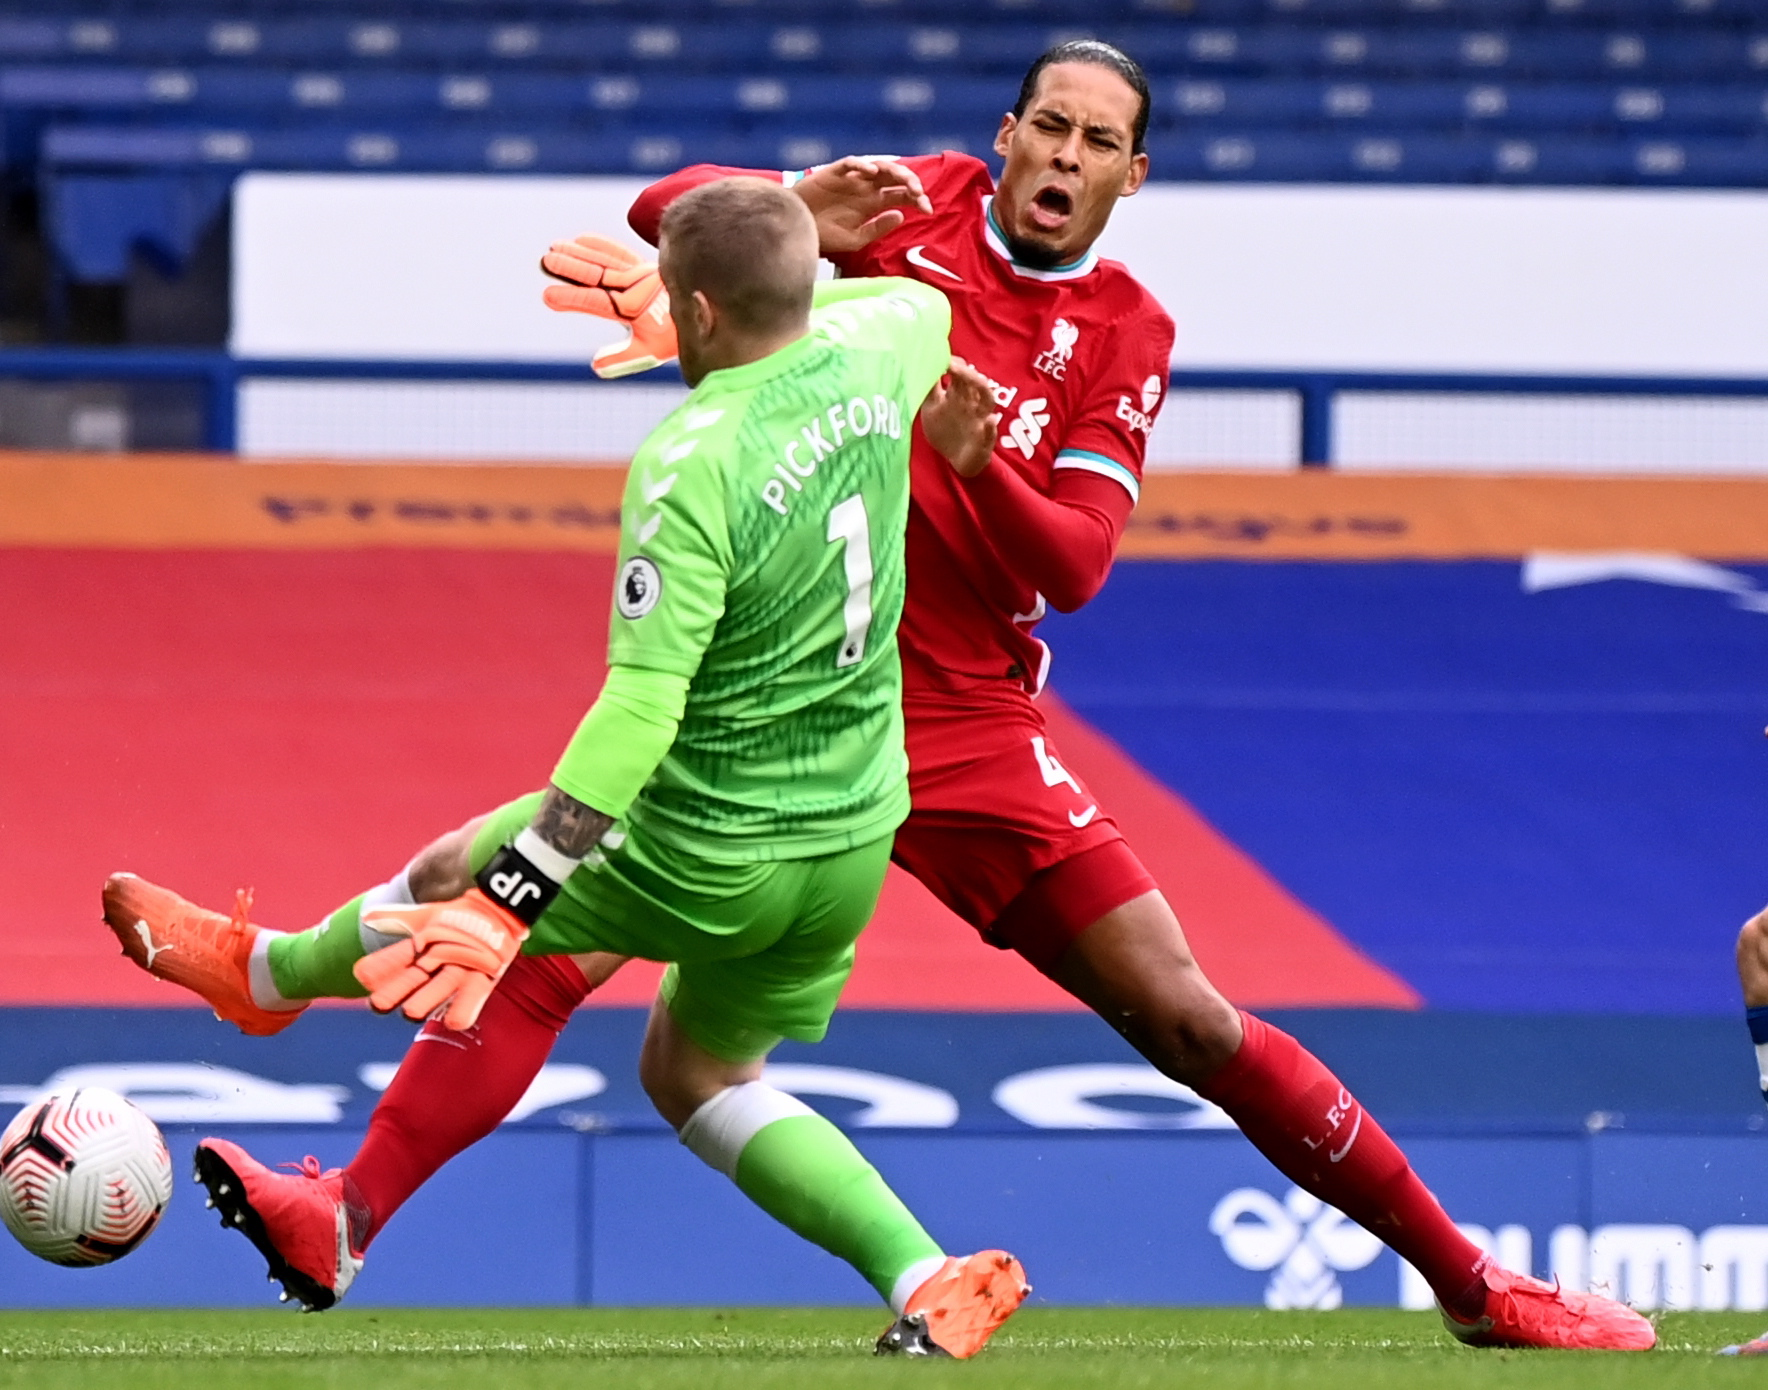 Jordan Pickford 'could still get three-match ban for Van Dijk challenge' as Liverpool star faces missing rest of season